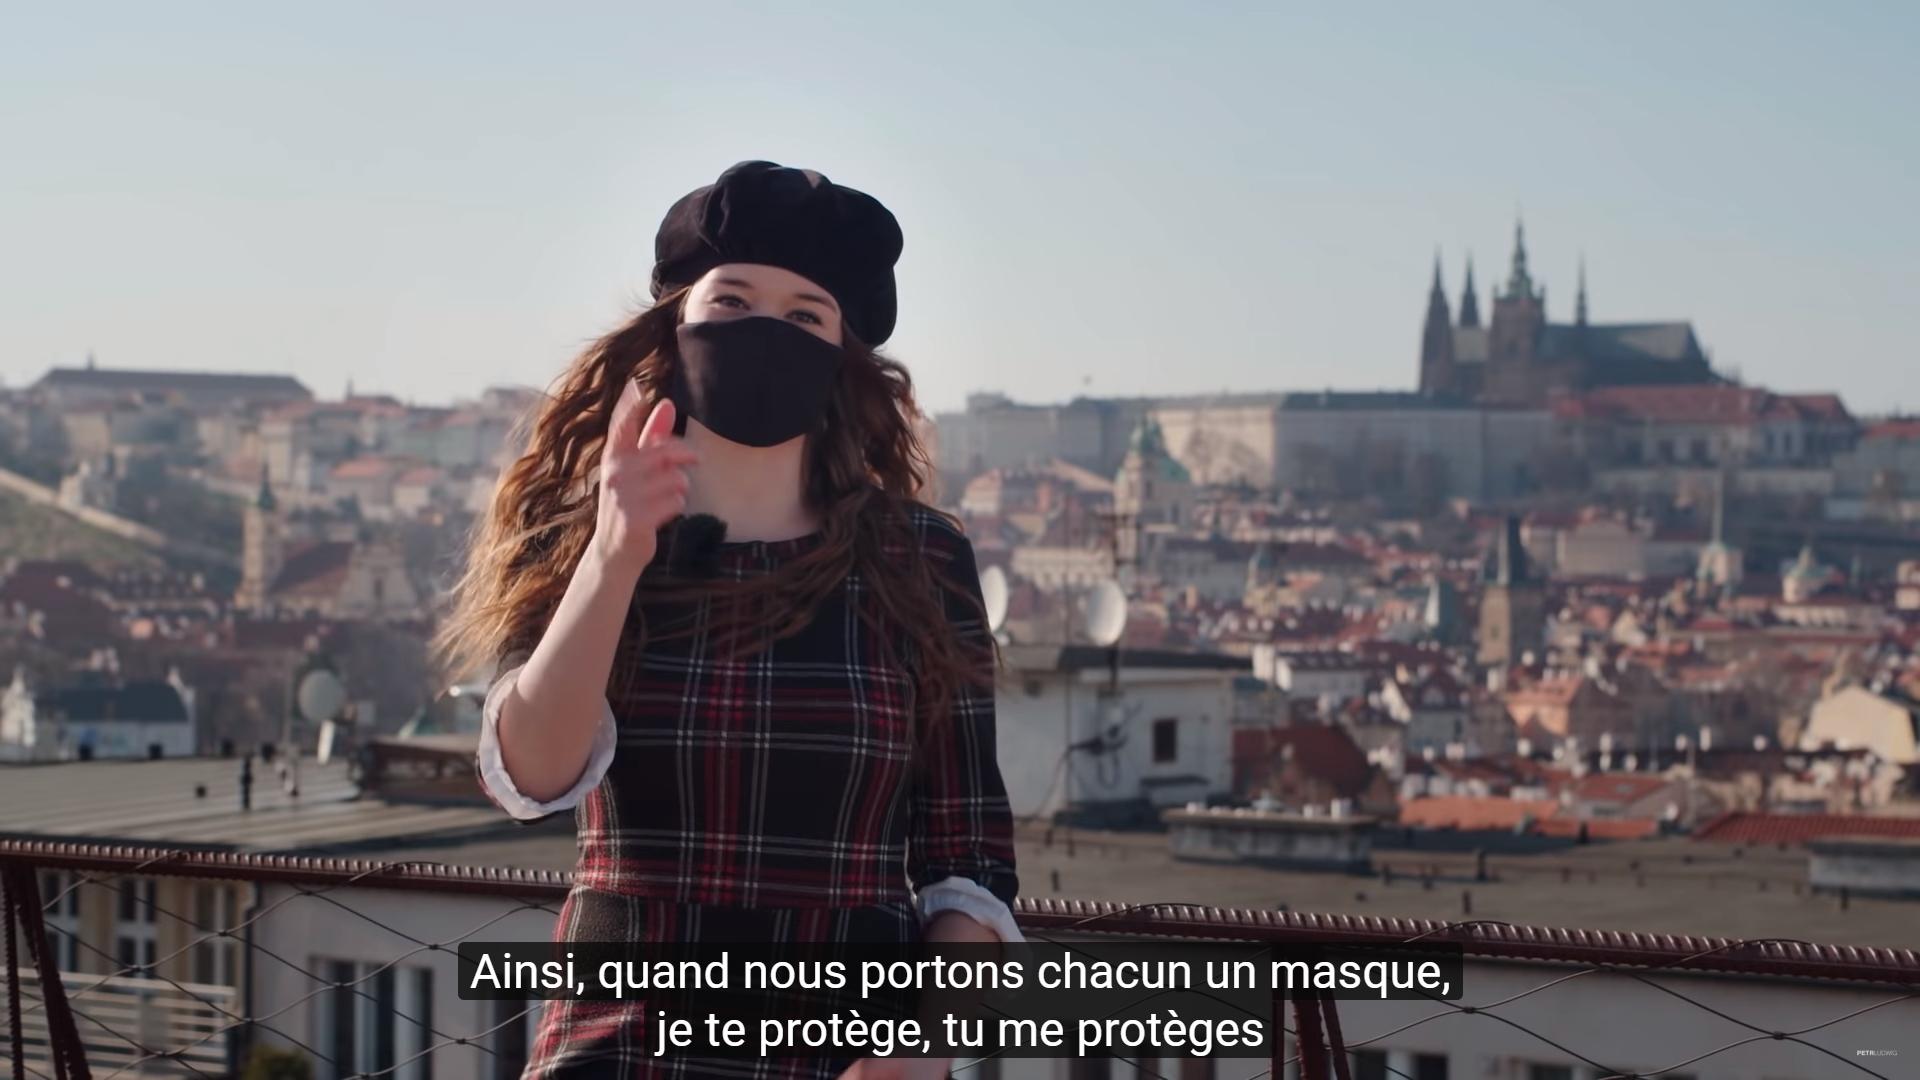 200407 - Campagne masks4all by compte Youtube Petr Ludwig Konec prokrastinace - La Déviation